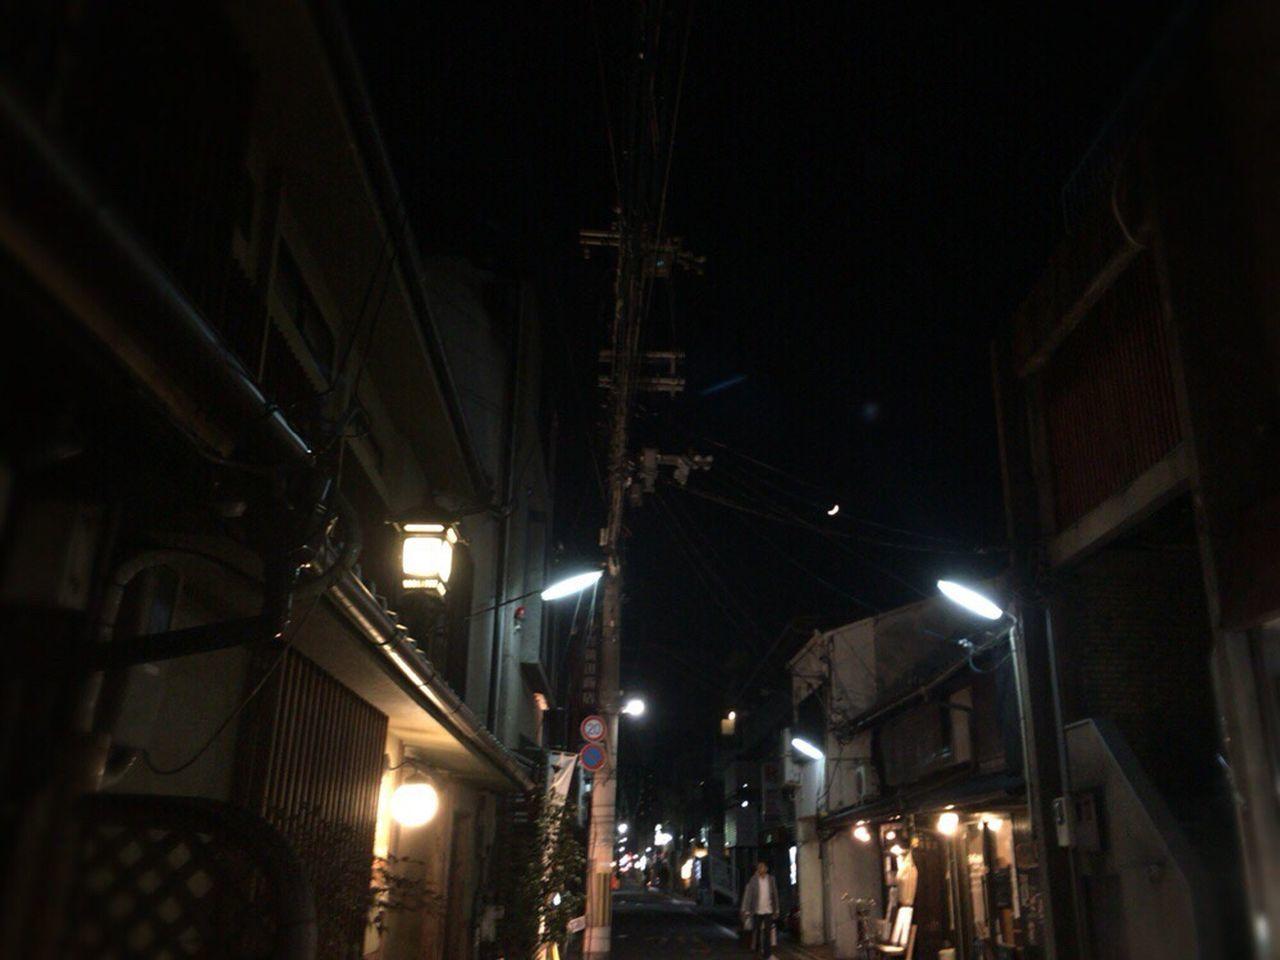 Kyoto Street Kyoto Fantastic Kyoto Matiya Kyoto Moon Kyoto NIght Lights Kyoto Night Kyoto Night Street